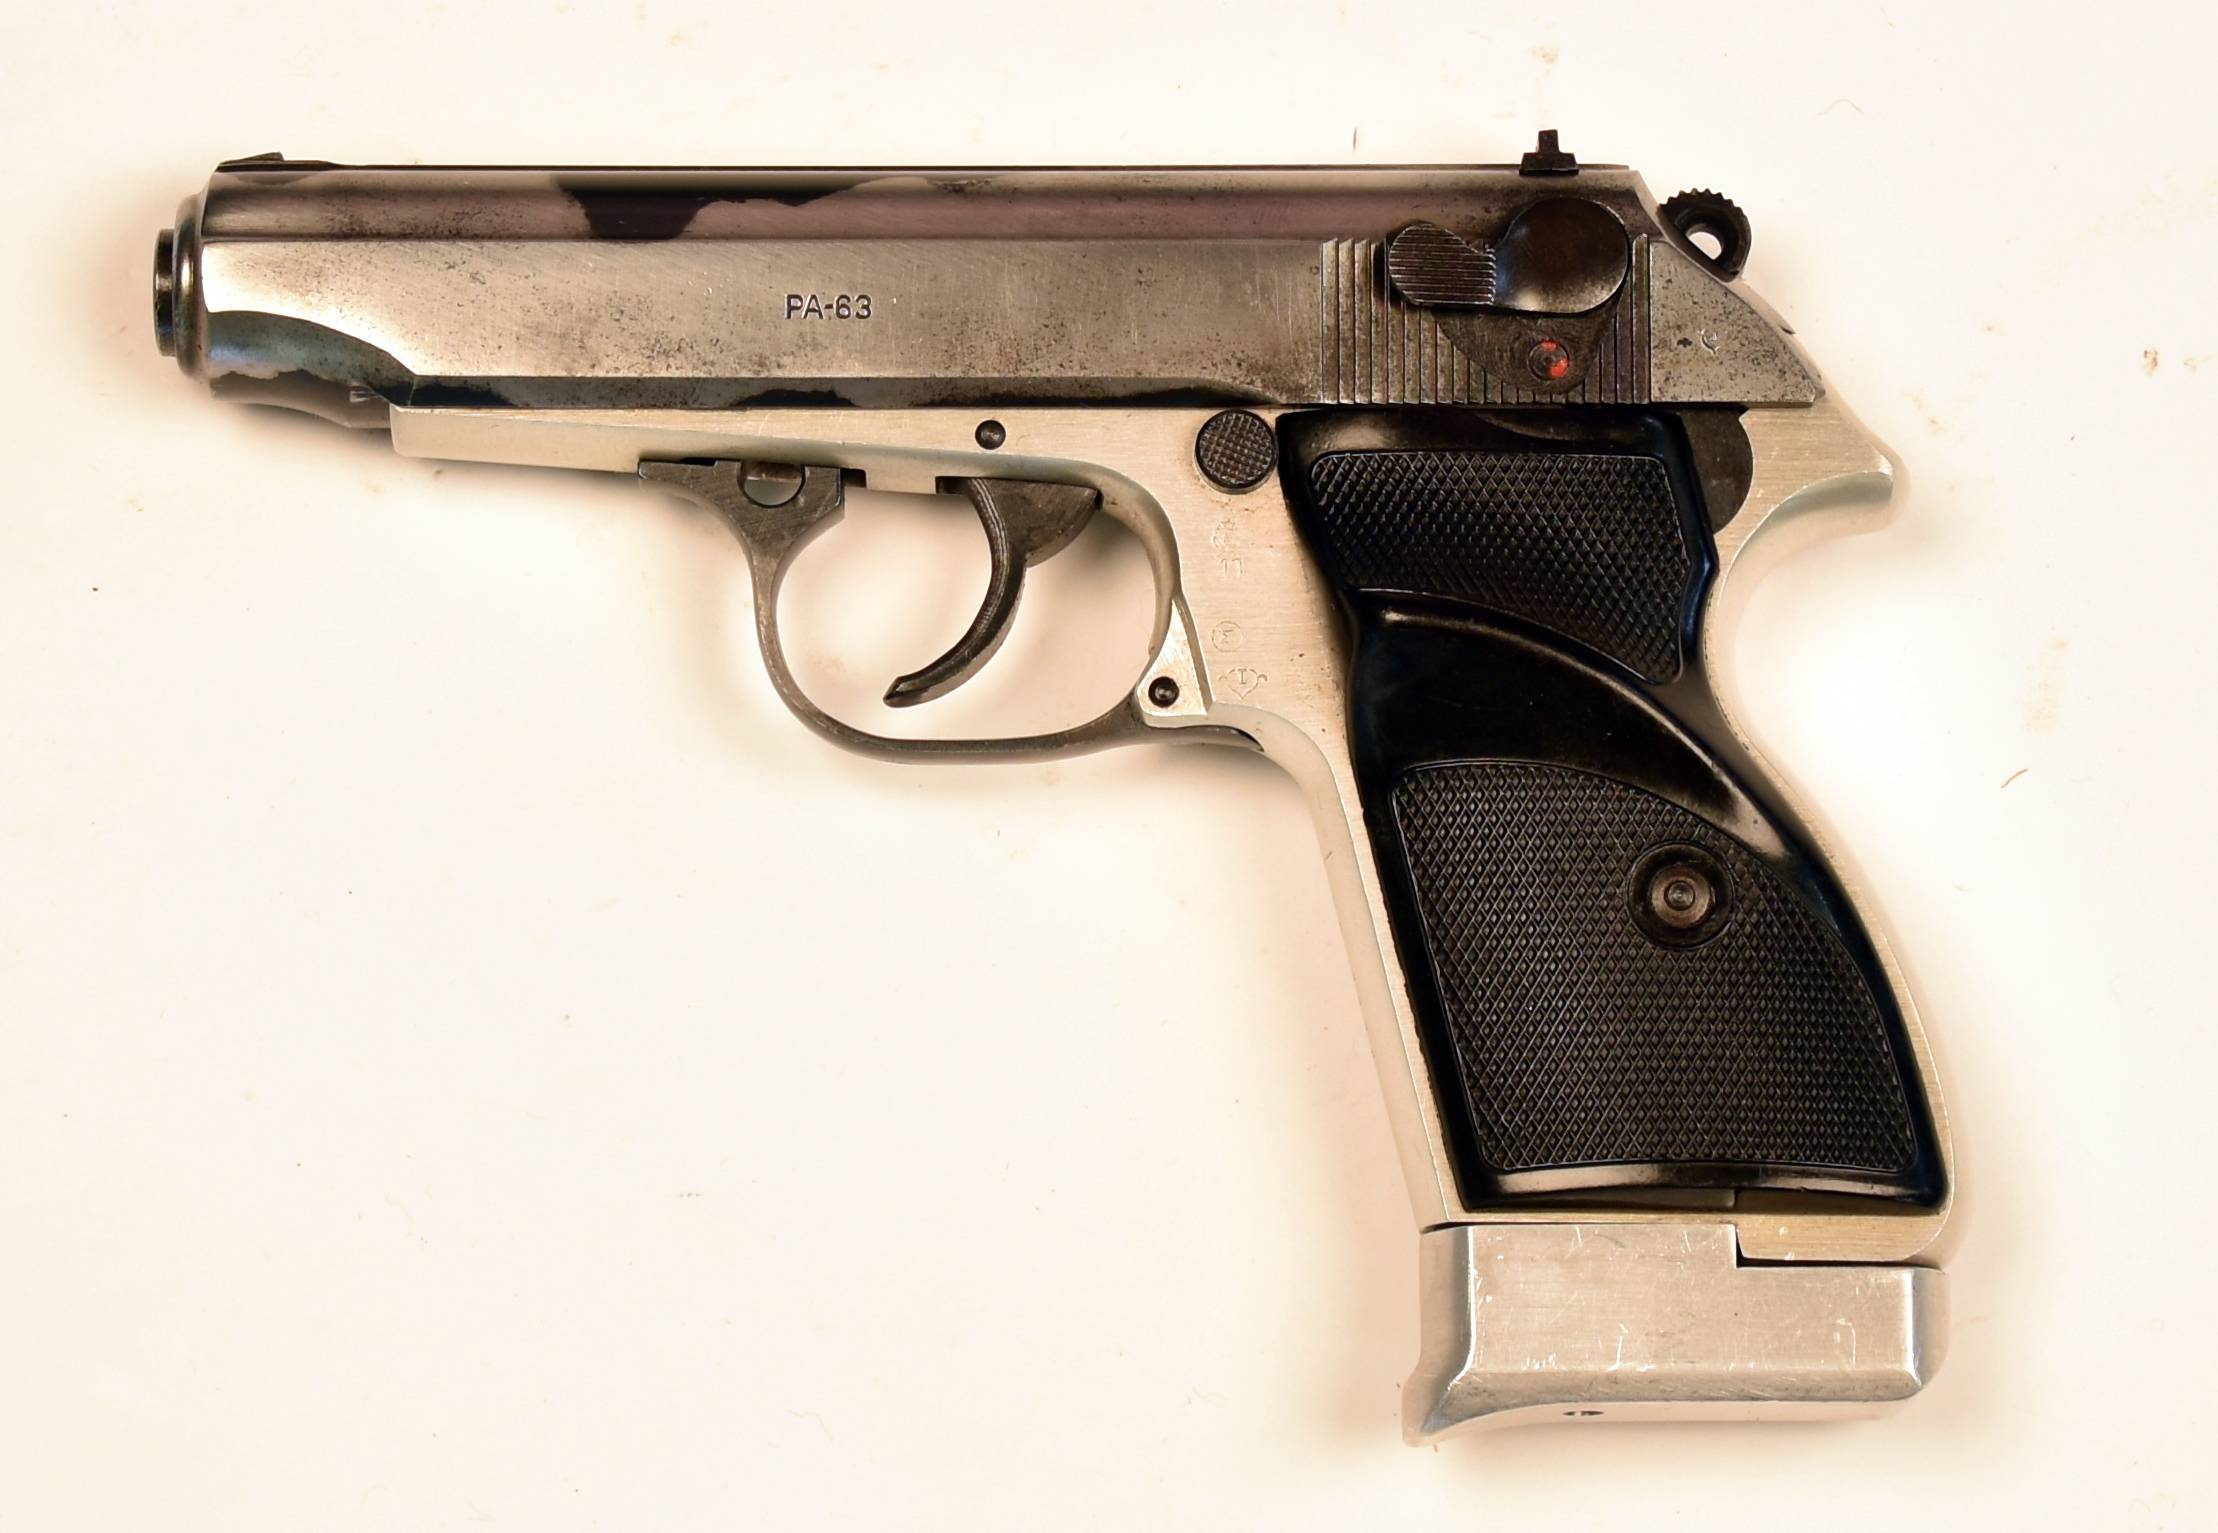 Пистолет-пулемет образец 63